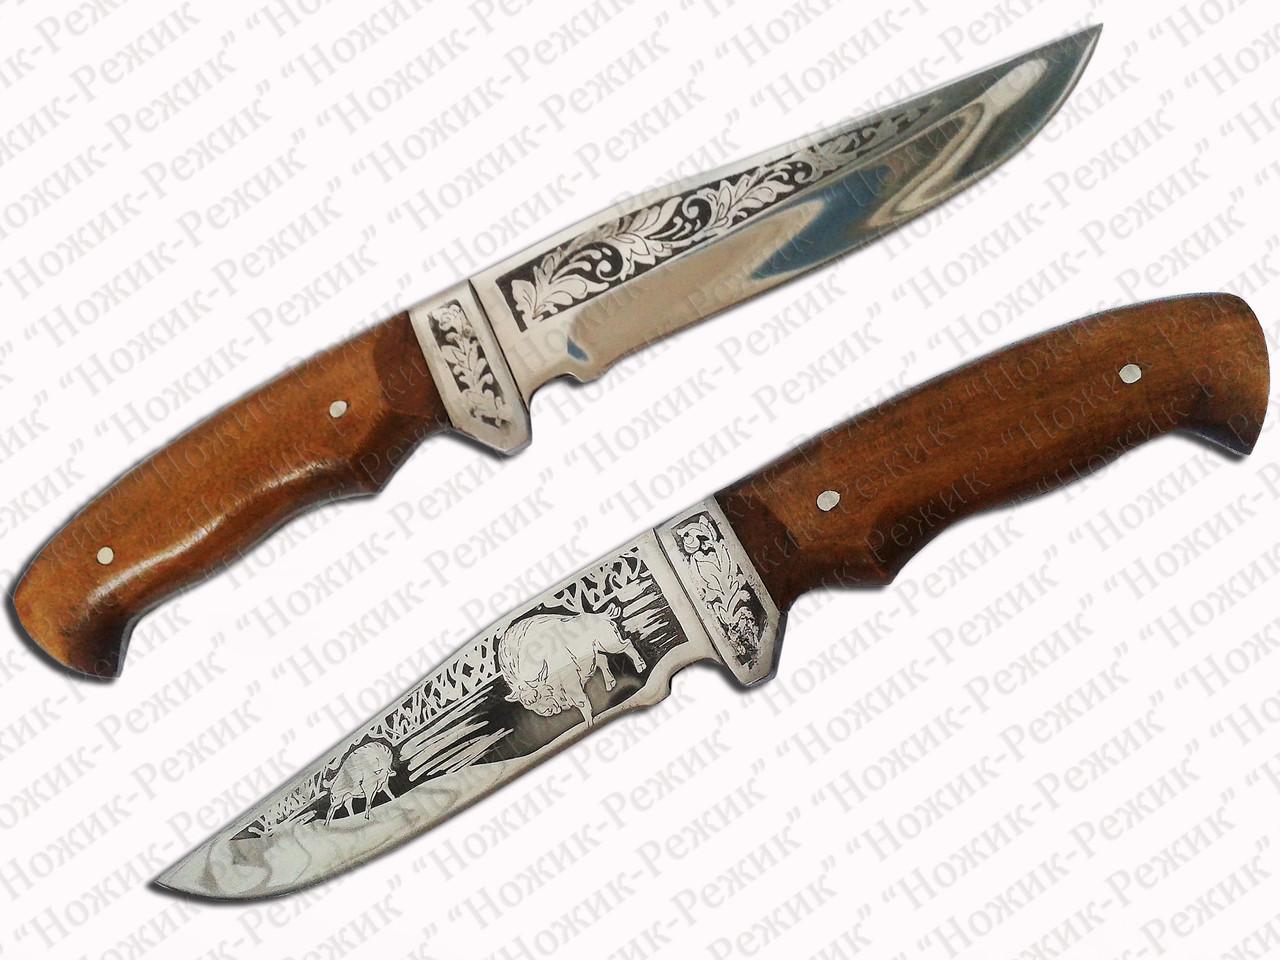 Нож для охоты, нож туристический, нож охотничий, нож рыбацкий, нож для разделки мяса, нож АТО